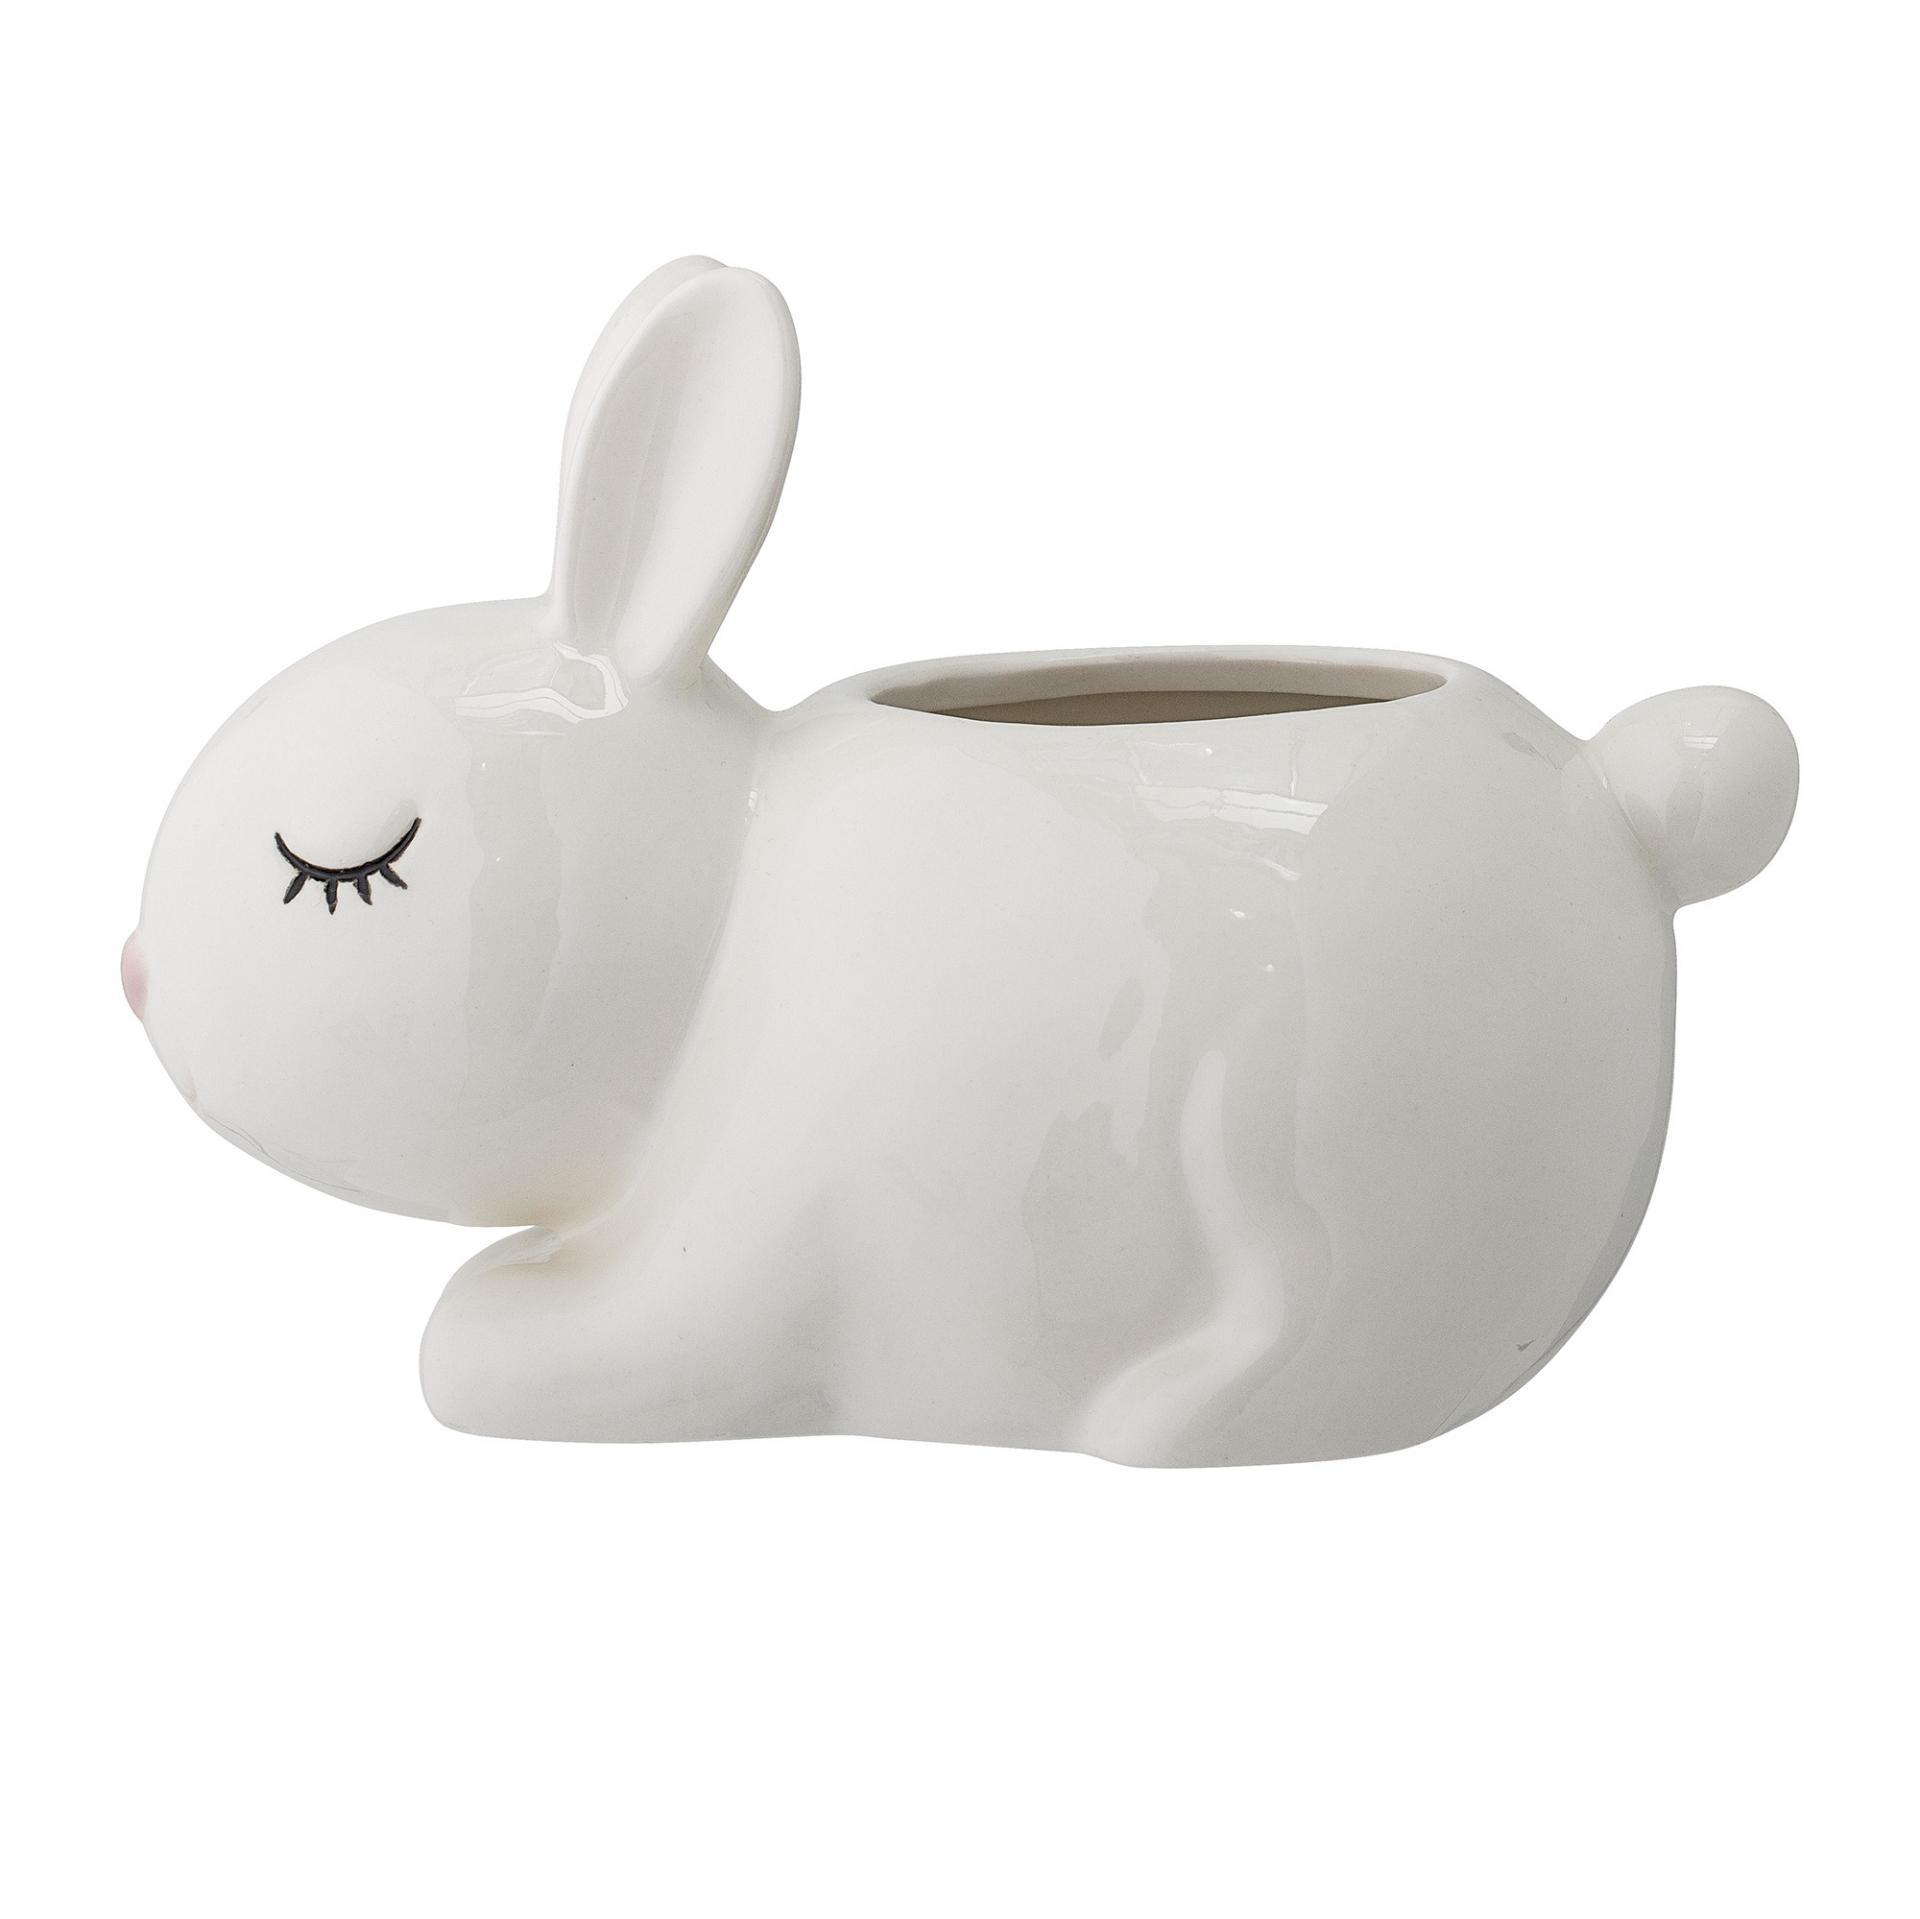 Bloomingville Stojánek na tužky Rabbit, bílá barva, porcelán